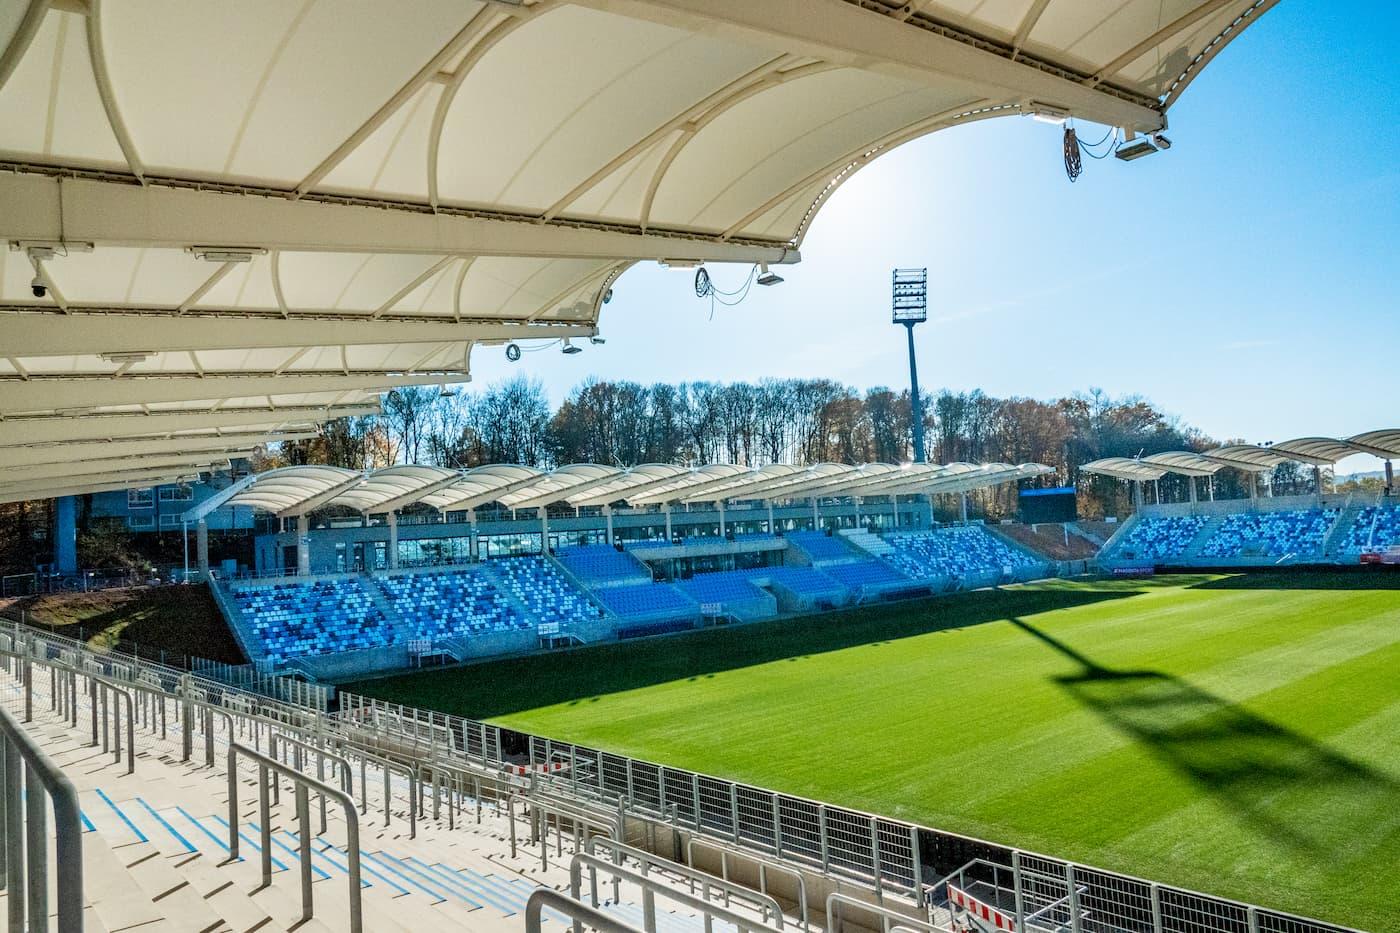 Ludwigsparkstadion Saarbrücken